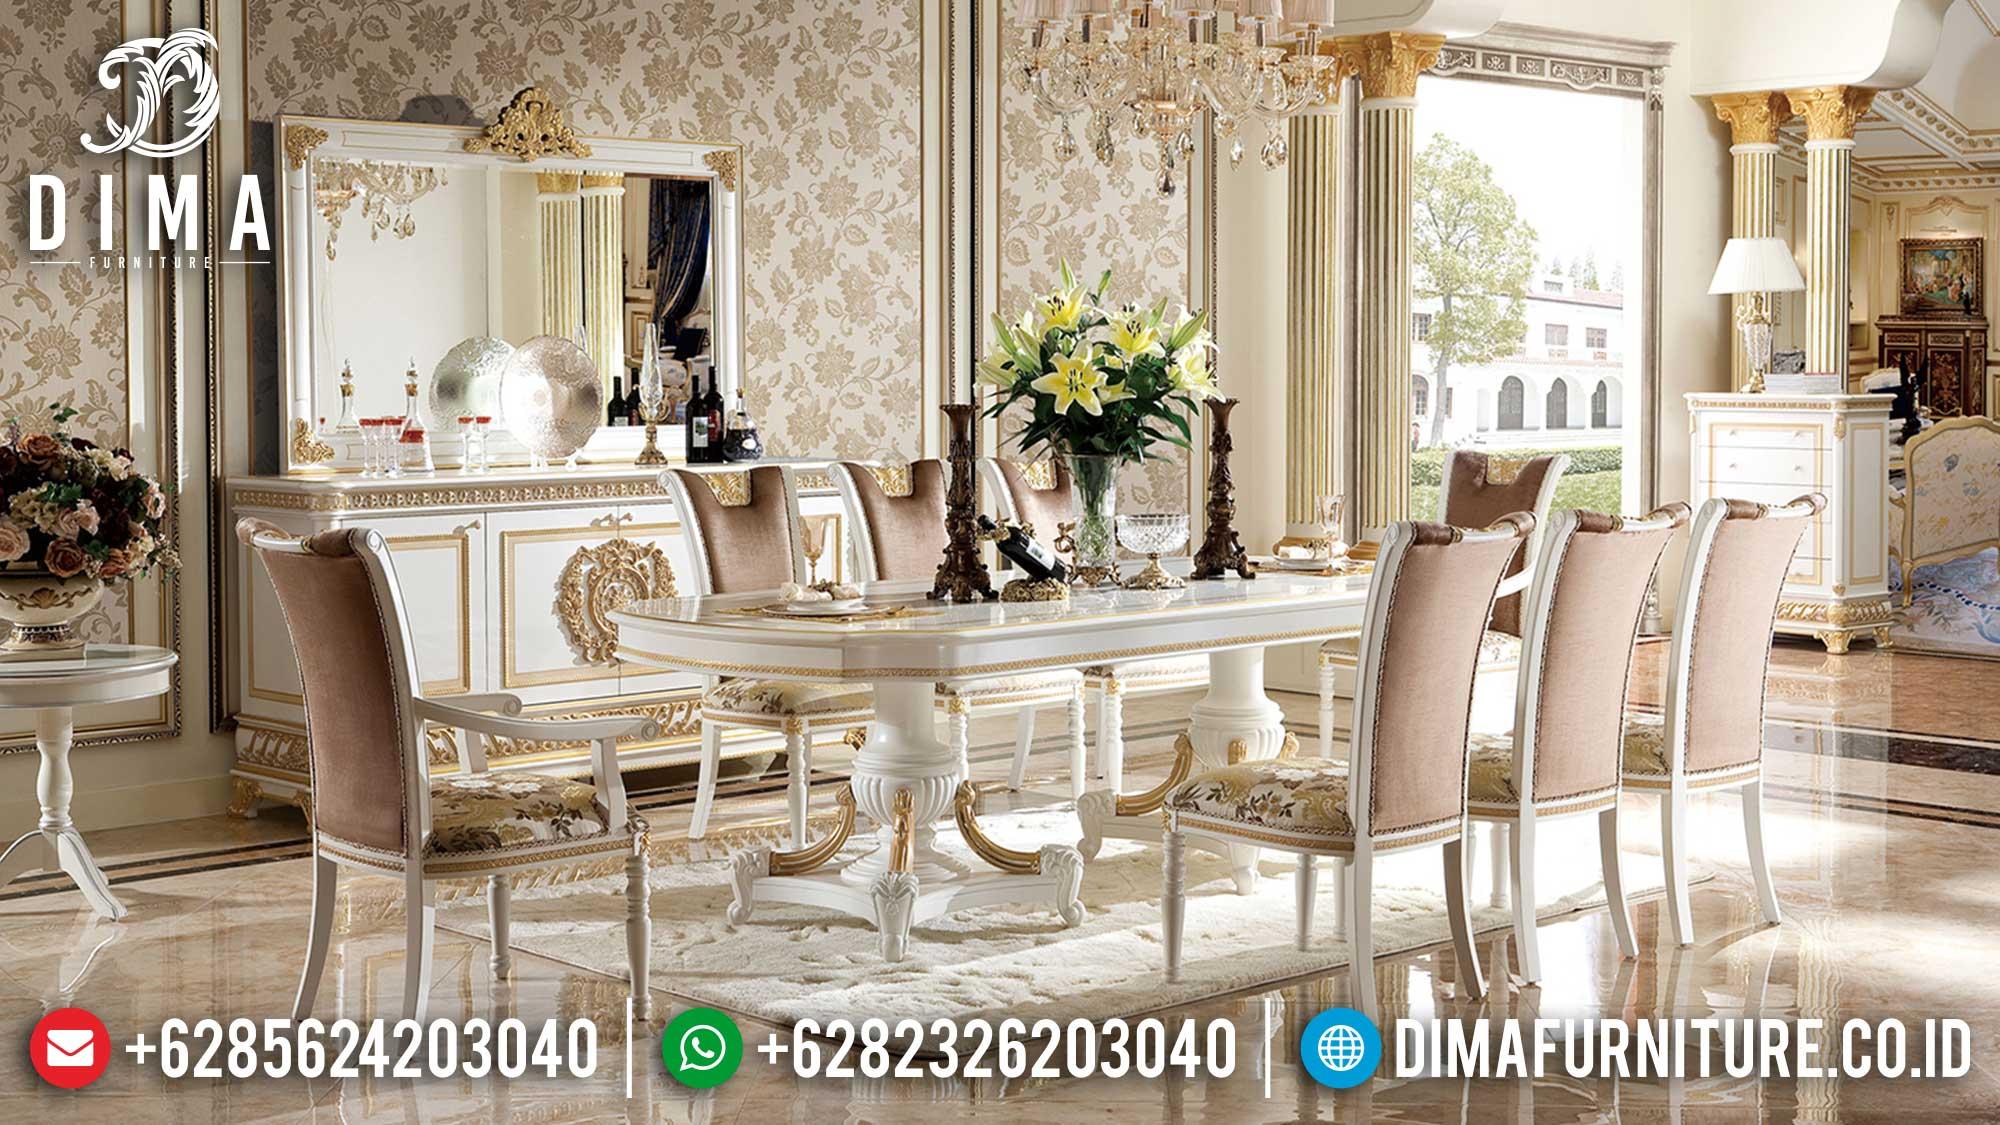 Jual Meja Makan Mewah 8 Kursi Luxury Elegant Model Solid Wood TTJ-1608